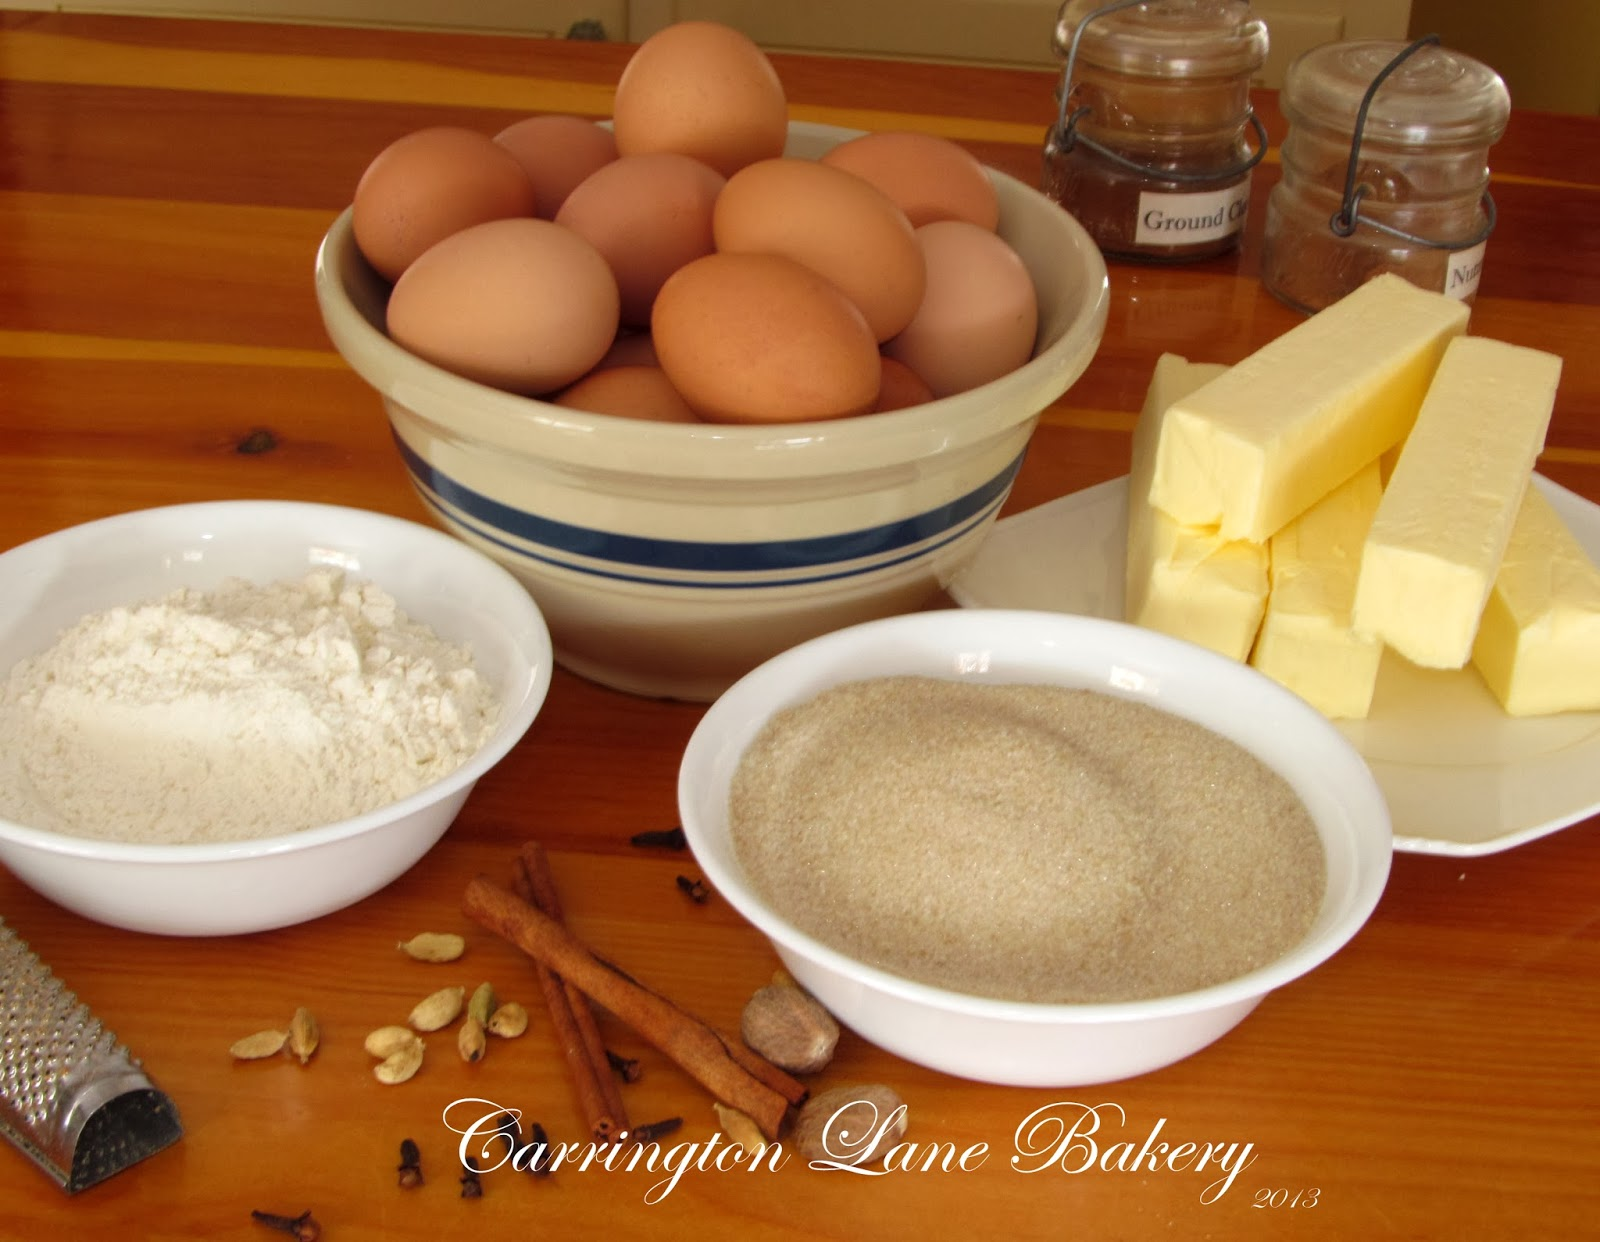 Carrington Lane Bakery Spekkoek Lapis Legit Or Thousand